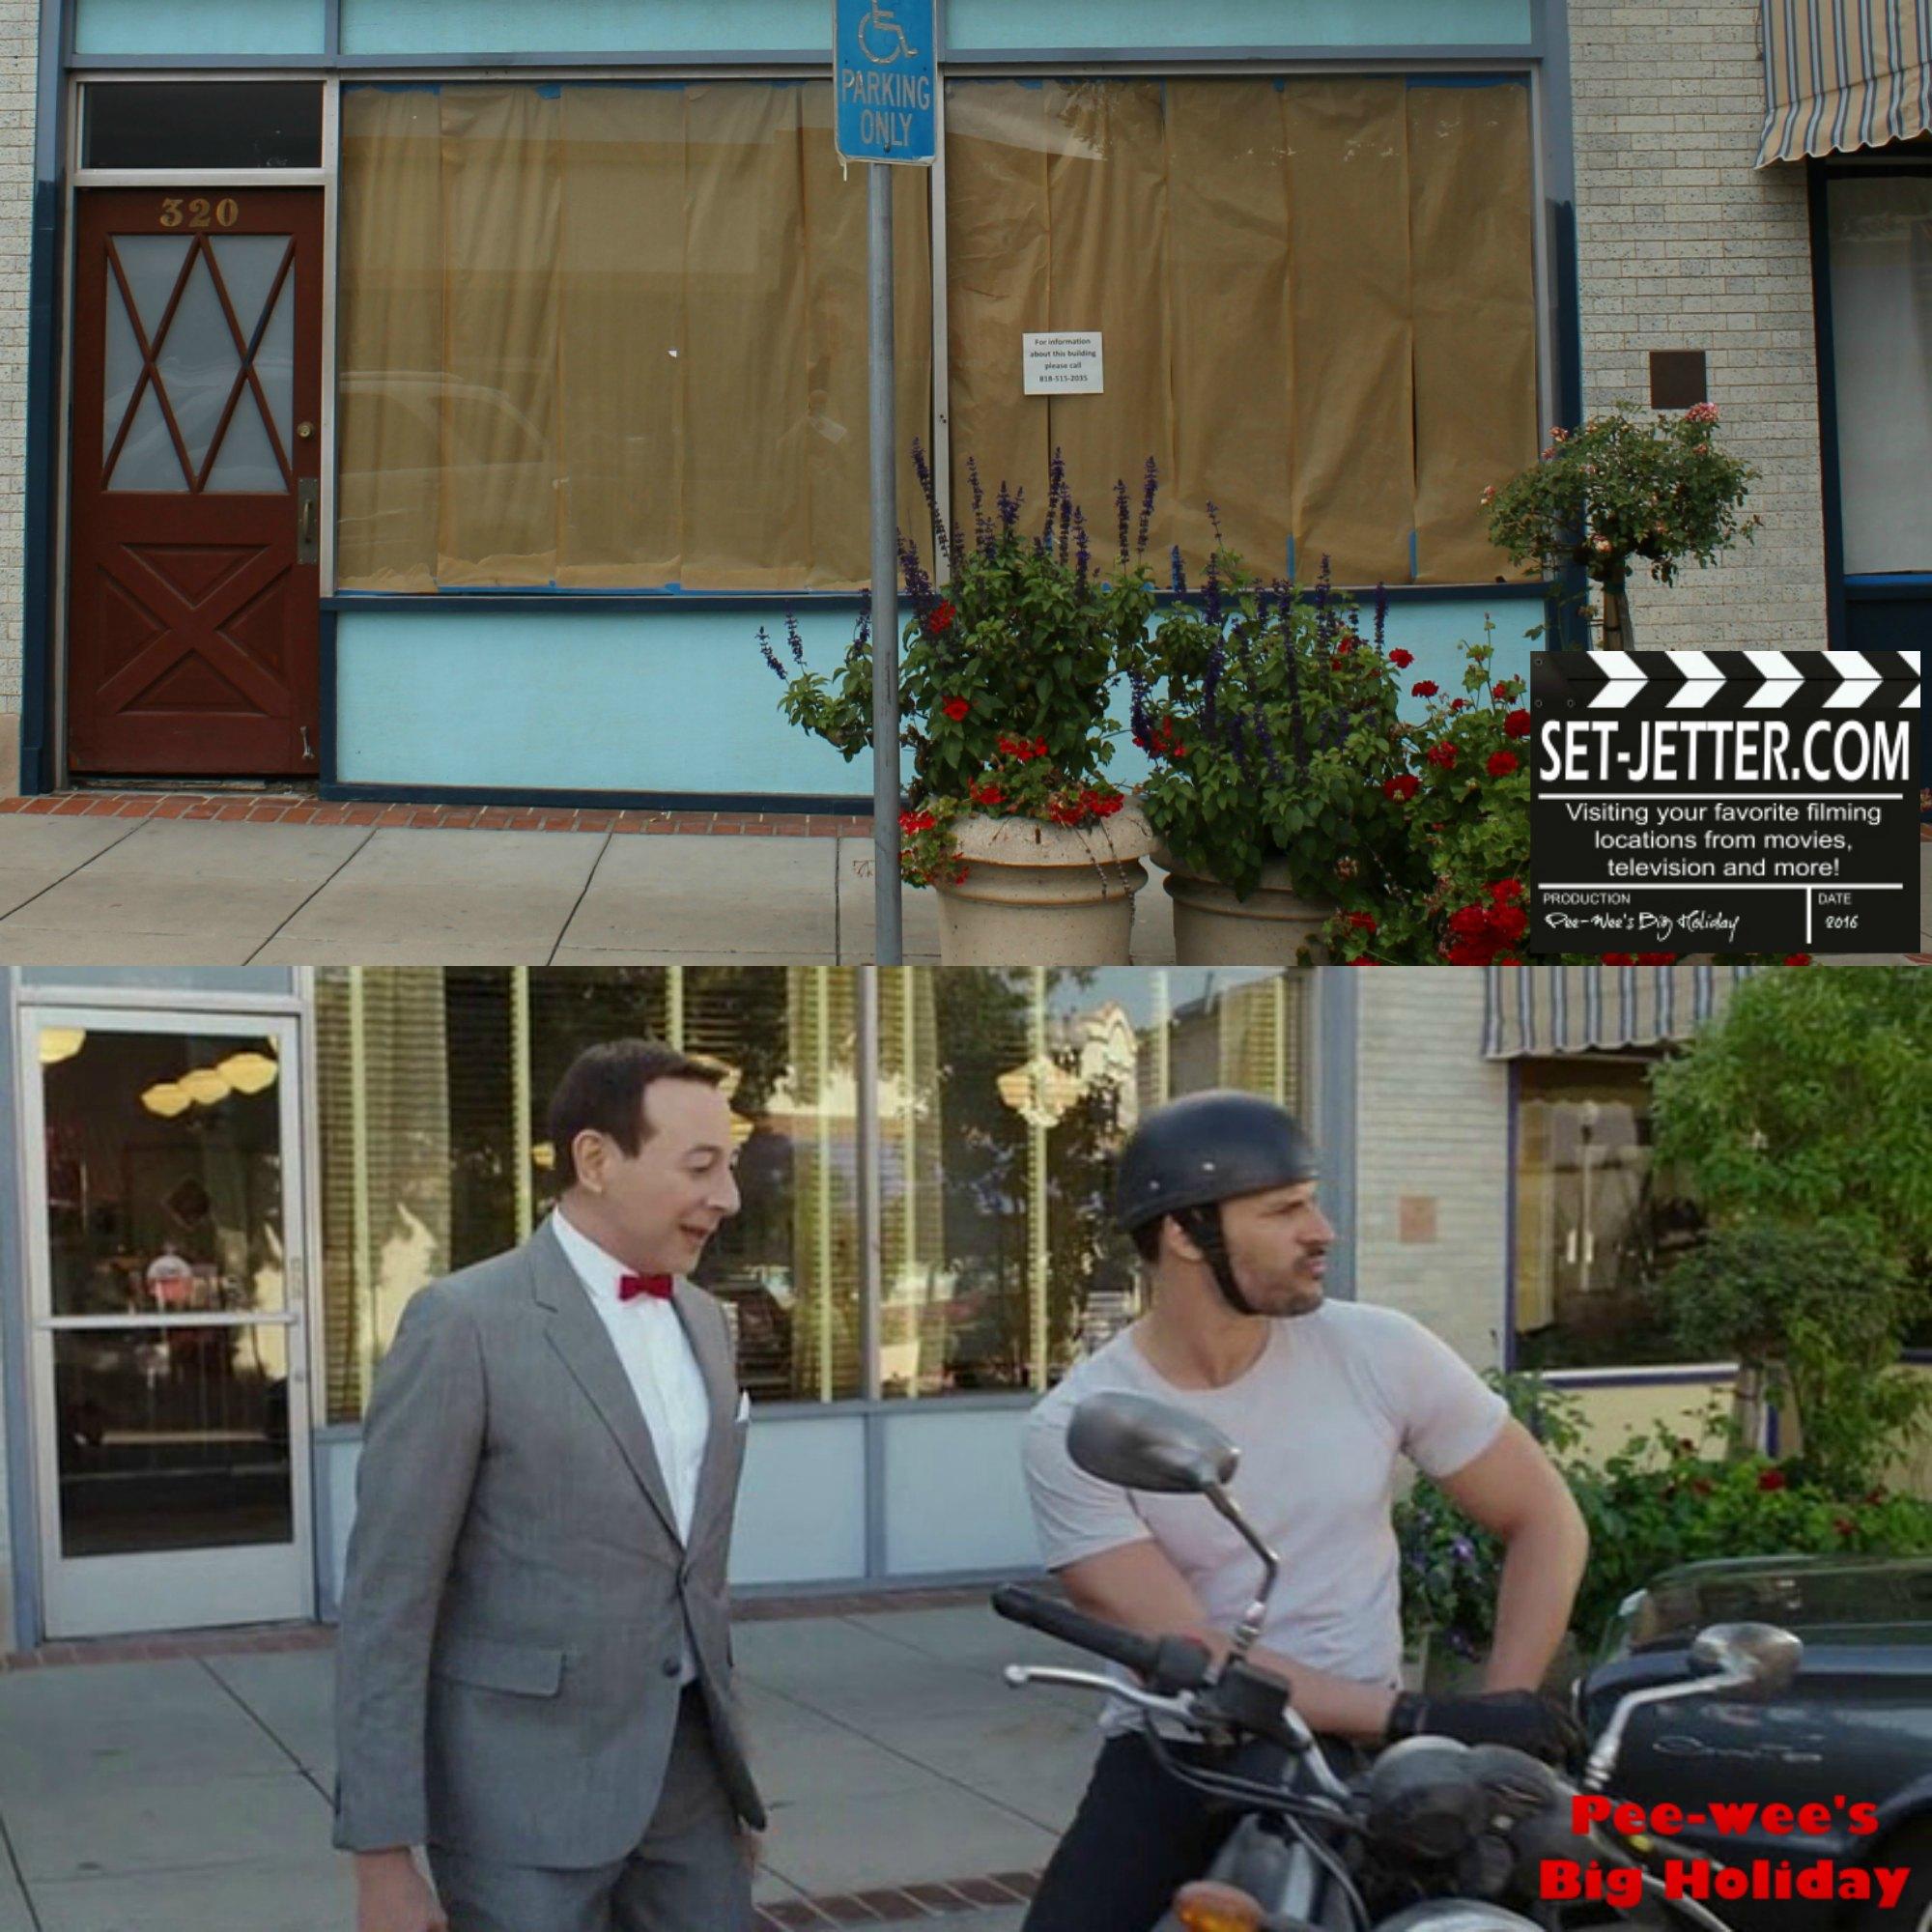 Pee Wee's Big Holiday comparison 298.jpg